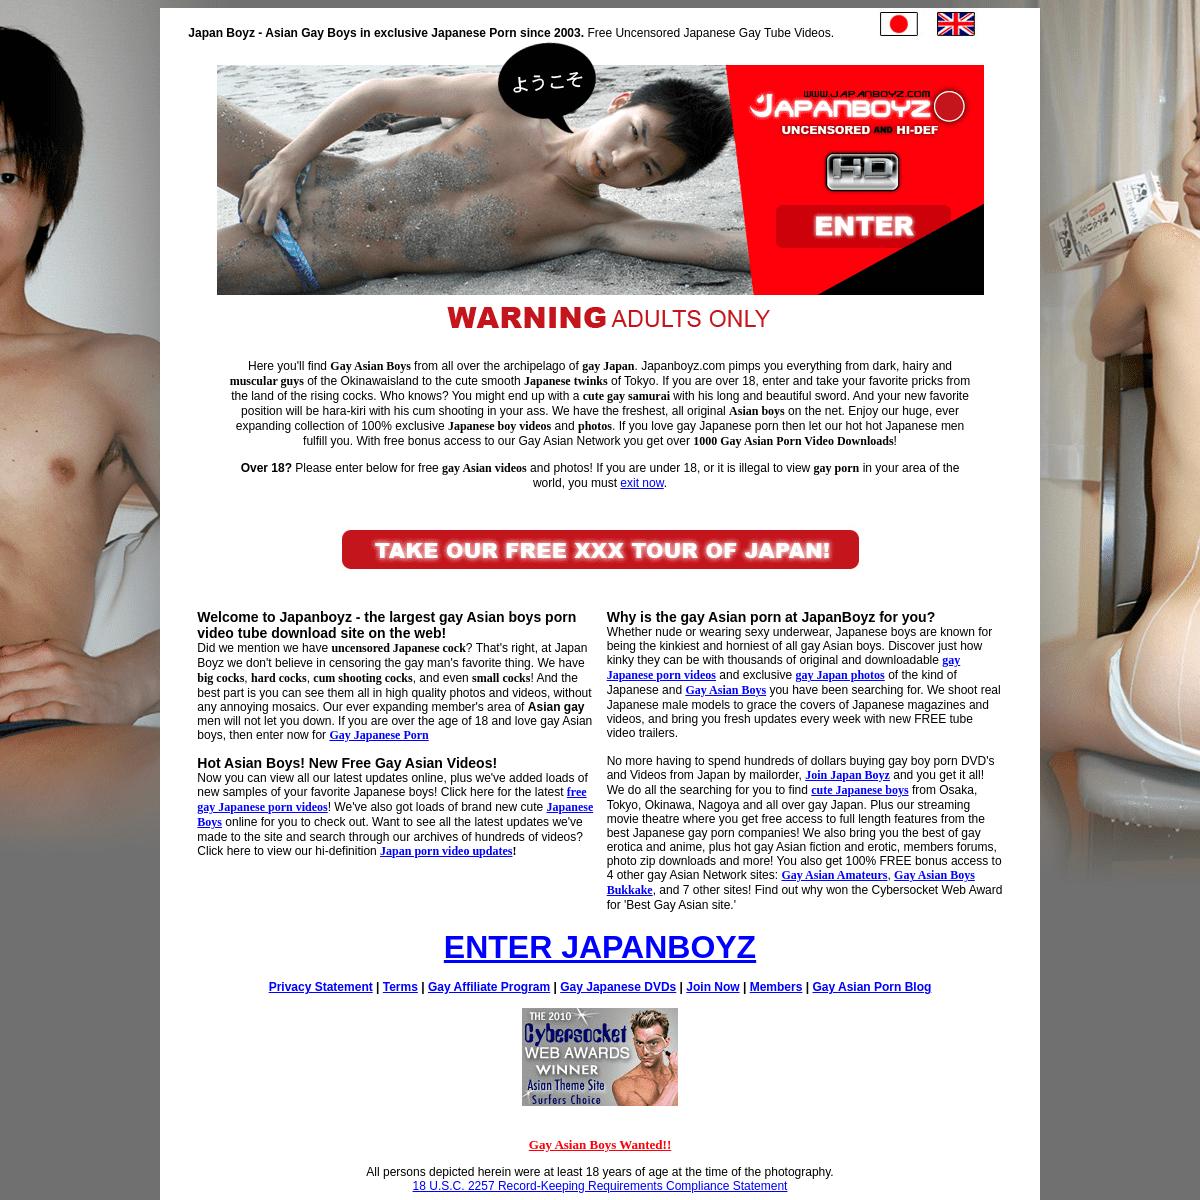 Asian Gay Boys - Exclusive Japanese Gay Videos - Gay Asian Porn